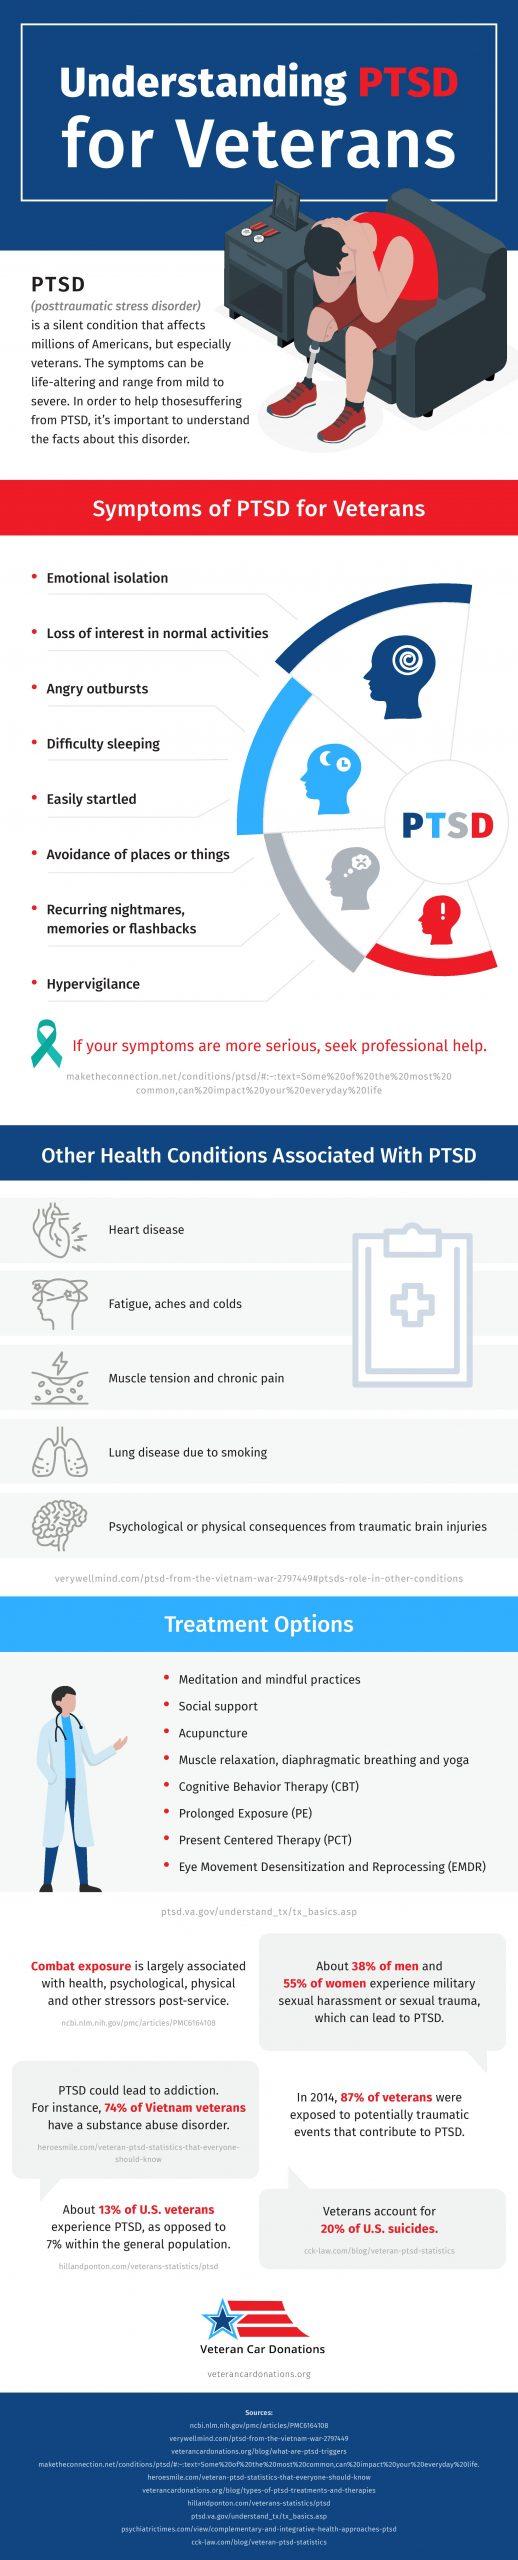 veterans ptsd infographic